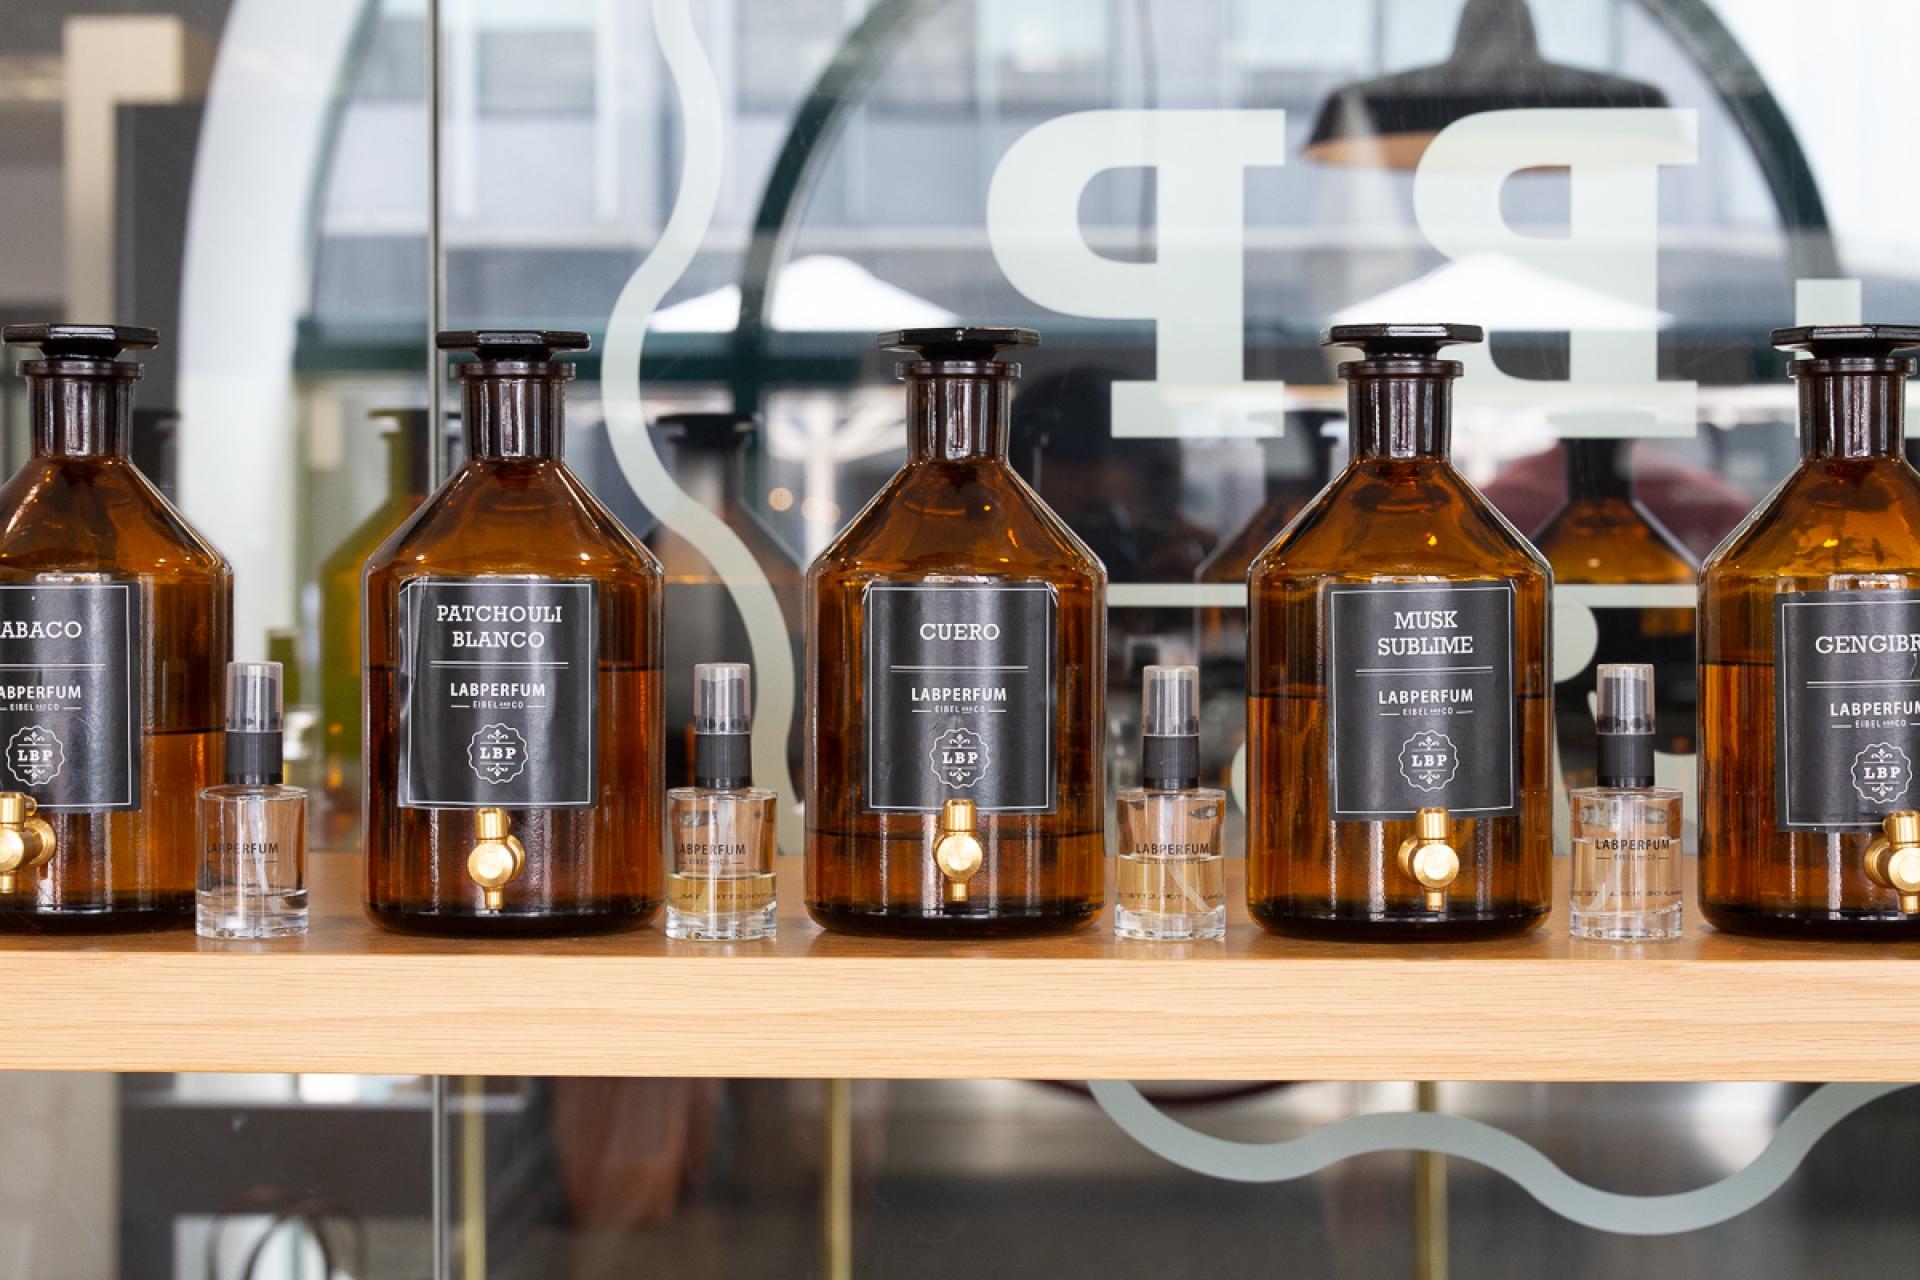 LisboaCool_Comprar_LPB_Museum_Concept_Store